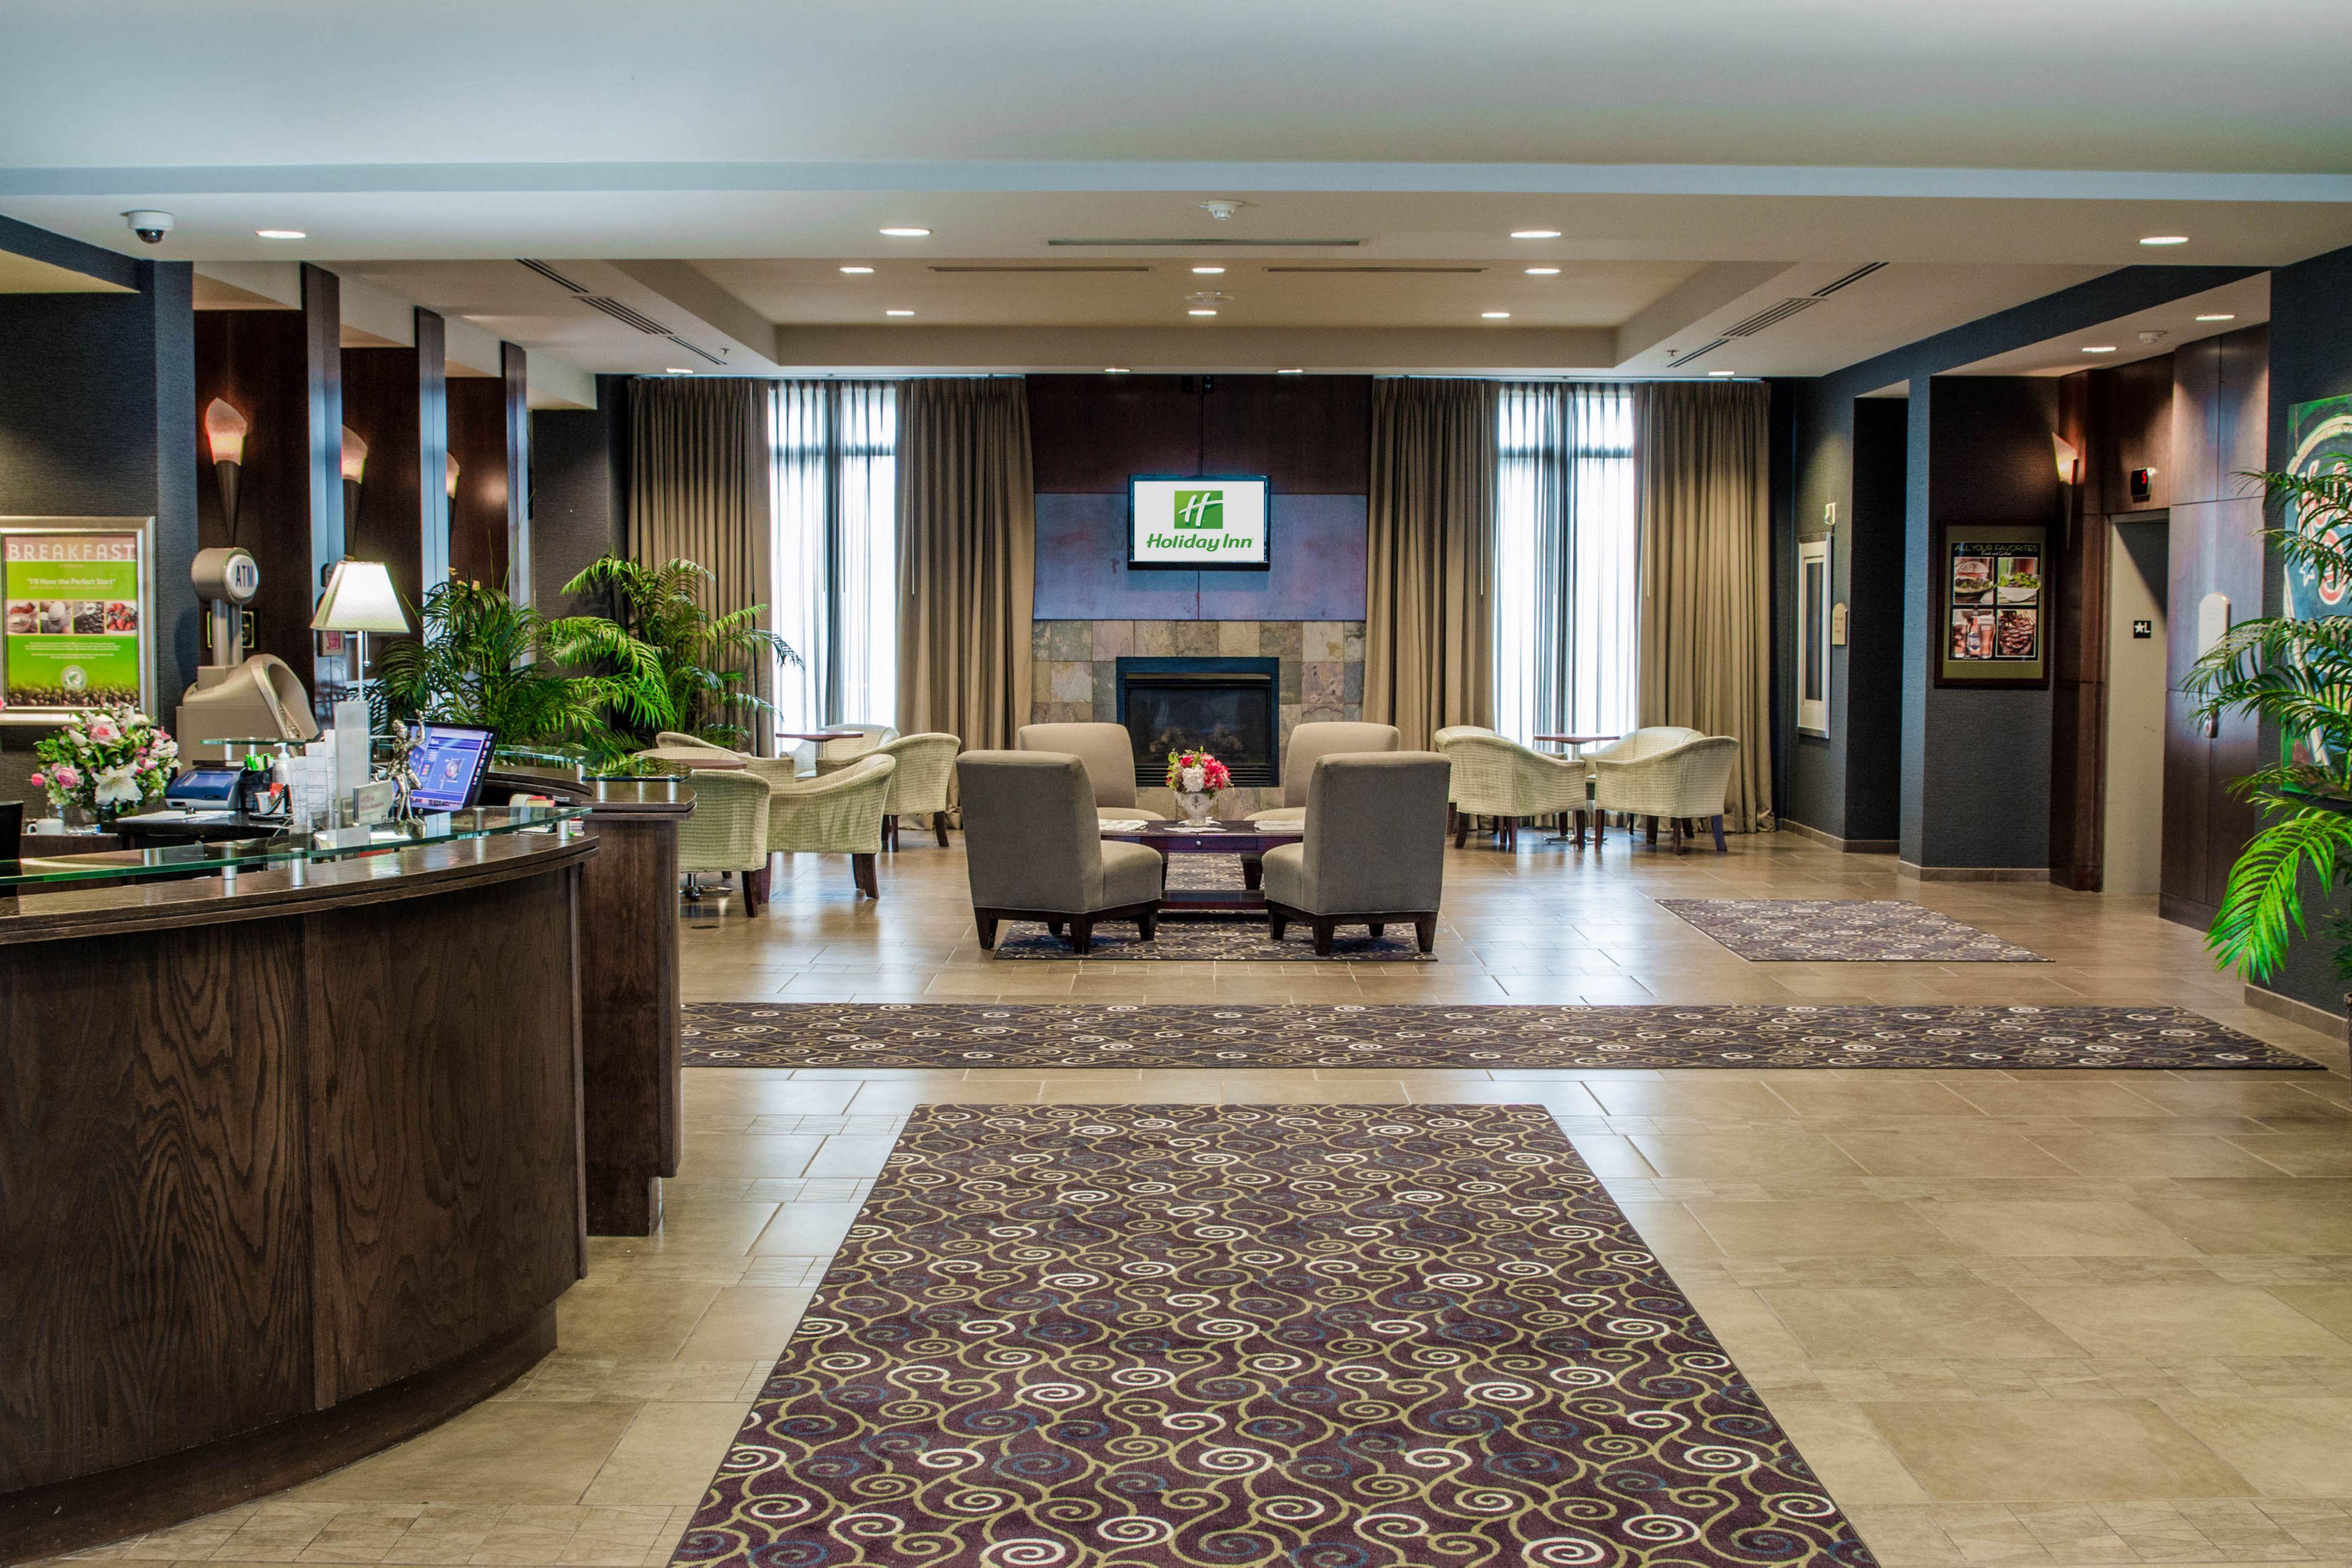 Holiday Inn Kansas City Airport image 4